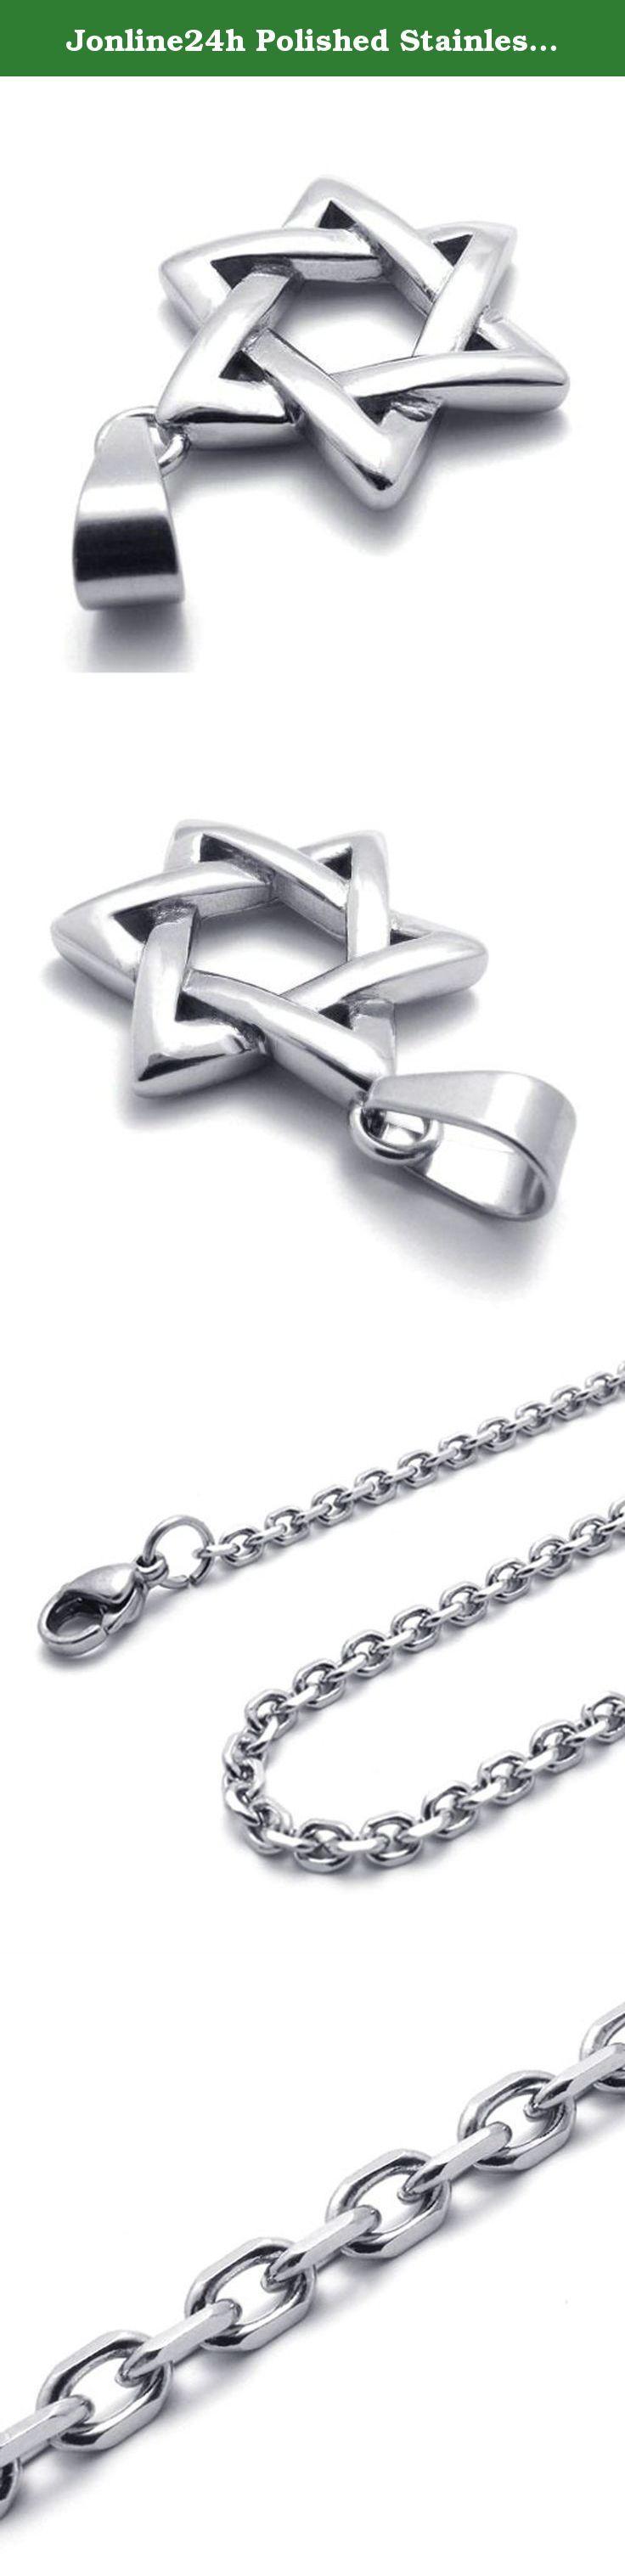 Shema israel bracelet israel bible jewish hebrew prayer kabbalah shma - Jonline24h Polished Stainless Steel Necklace Lucky Star Of David Pendant Silver 18